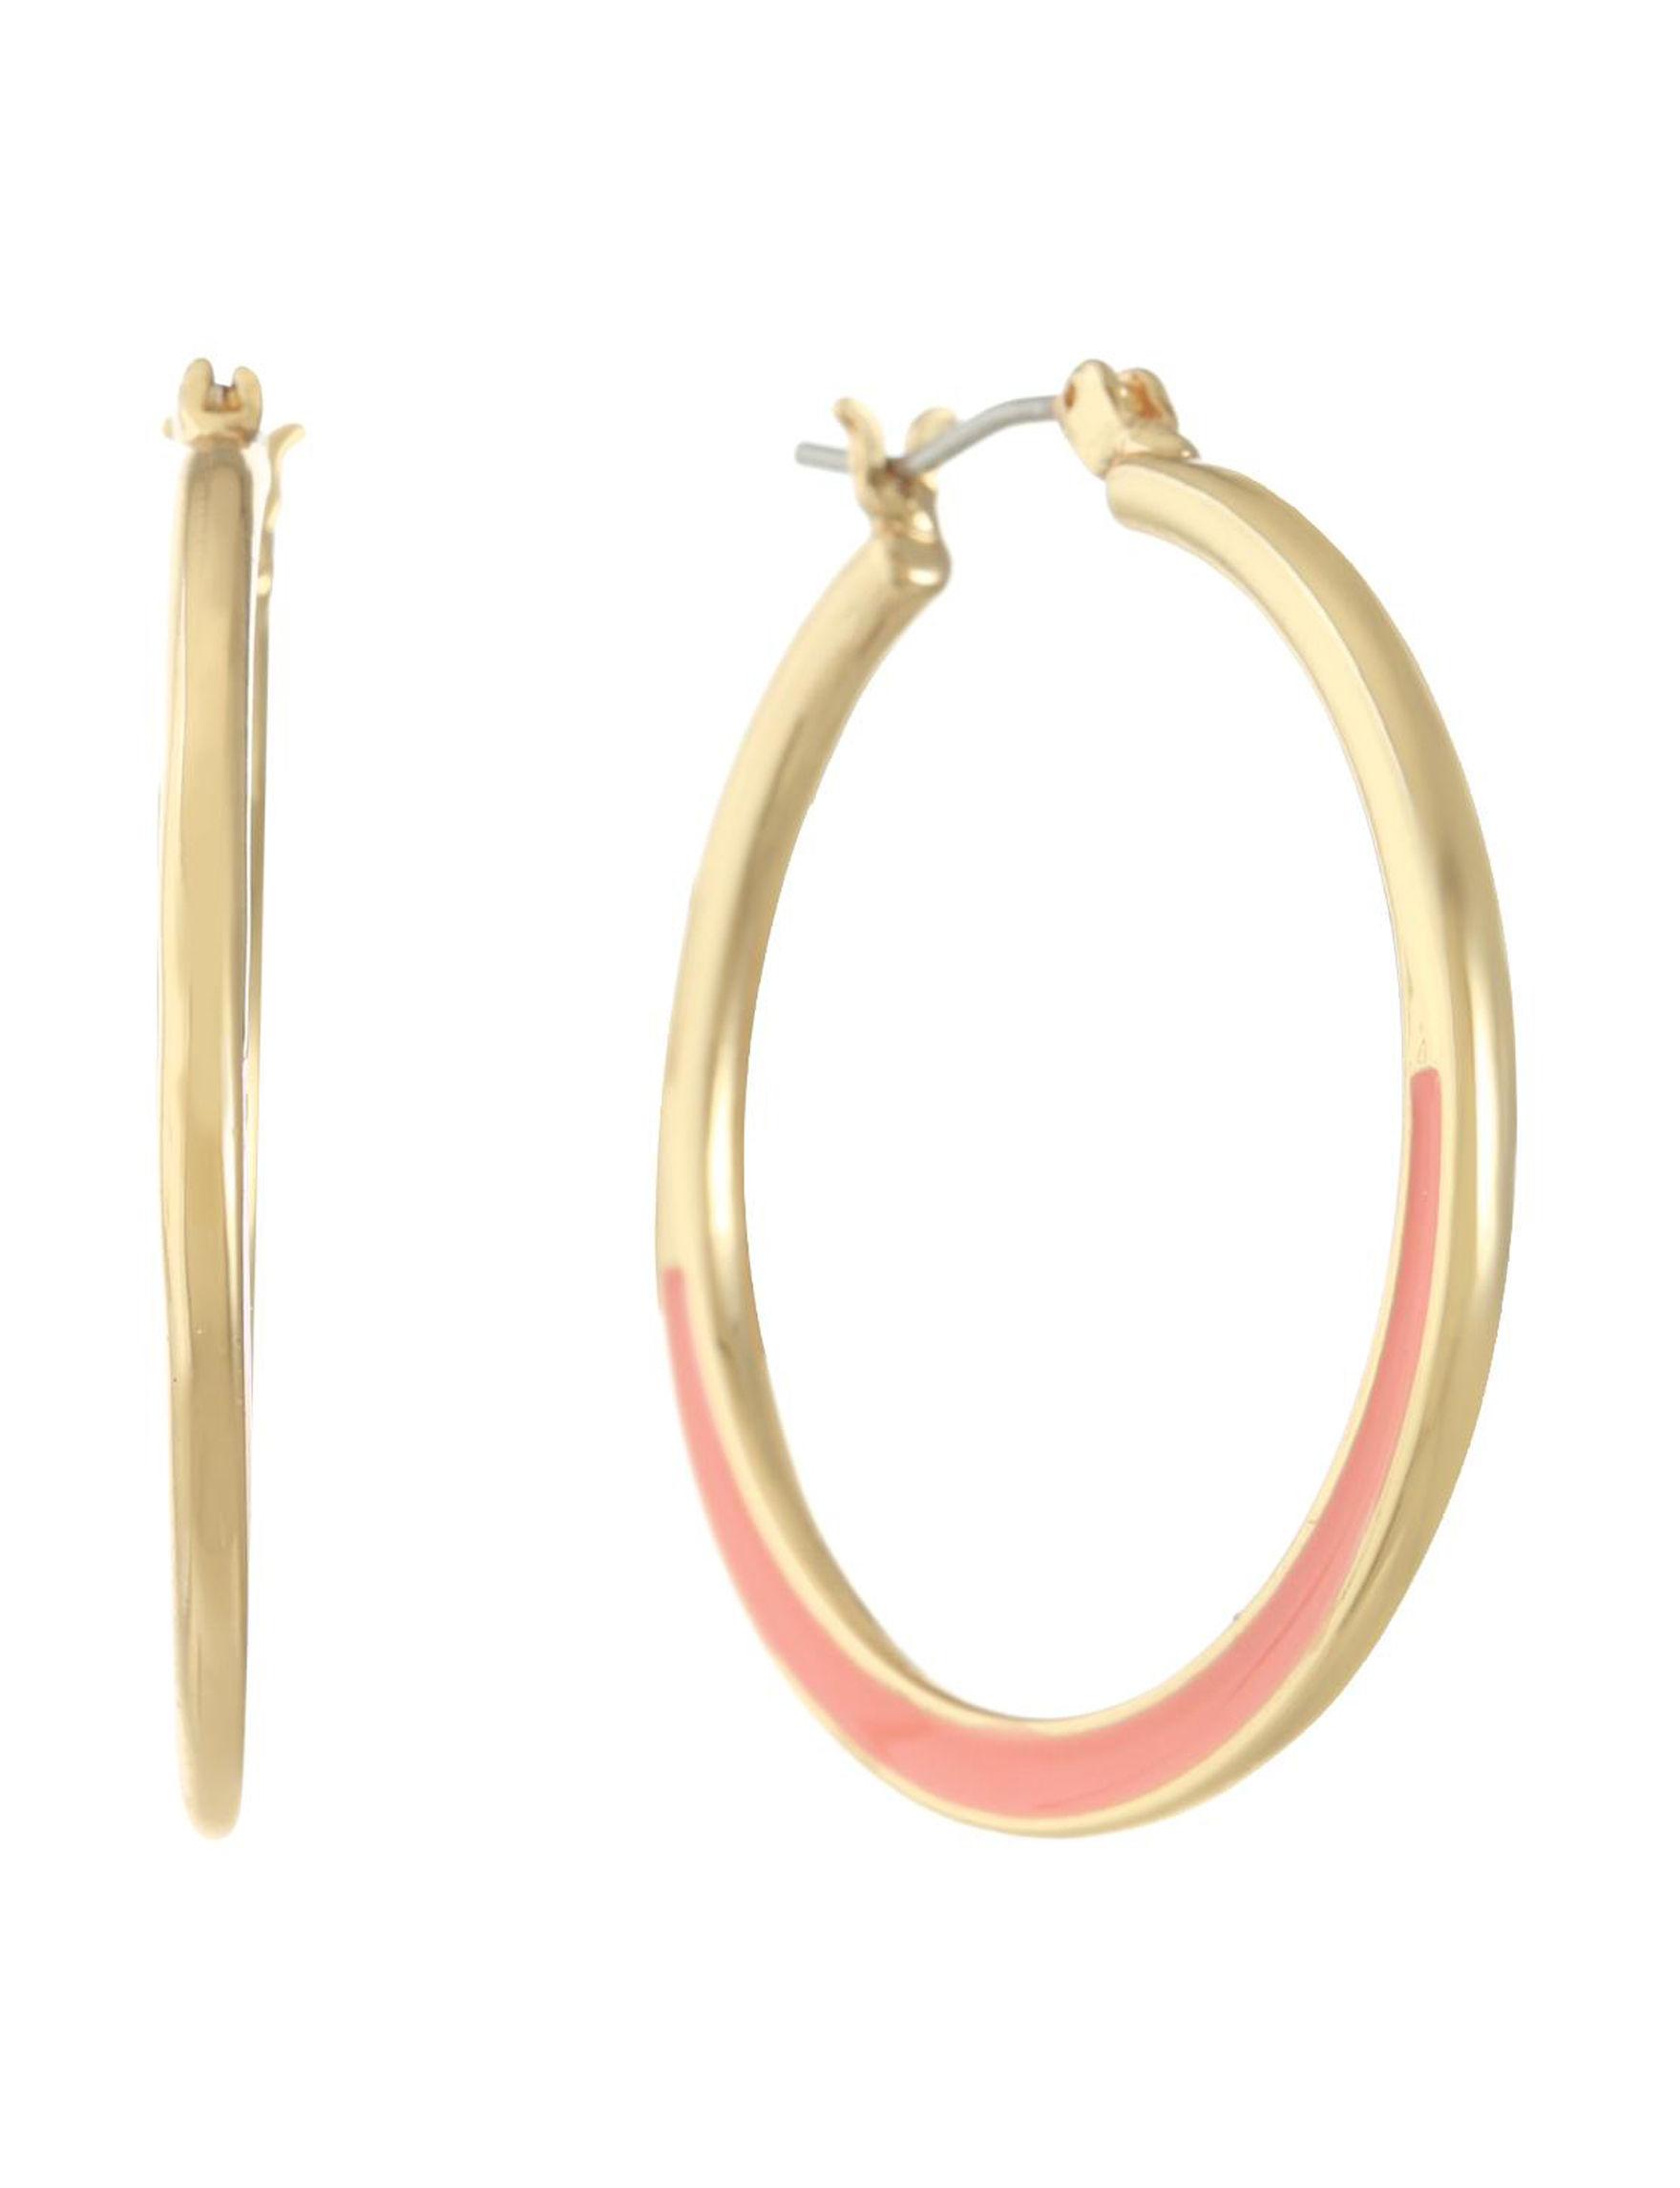 Gloria Vanderbilt Coral / Gold Hoops Earrings Fashion Jewelry